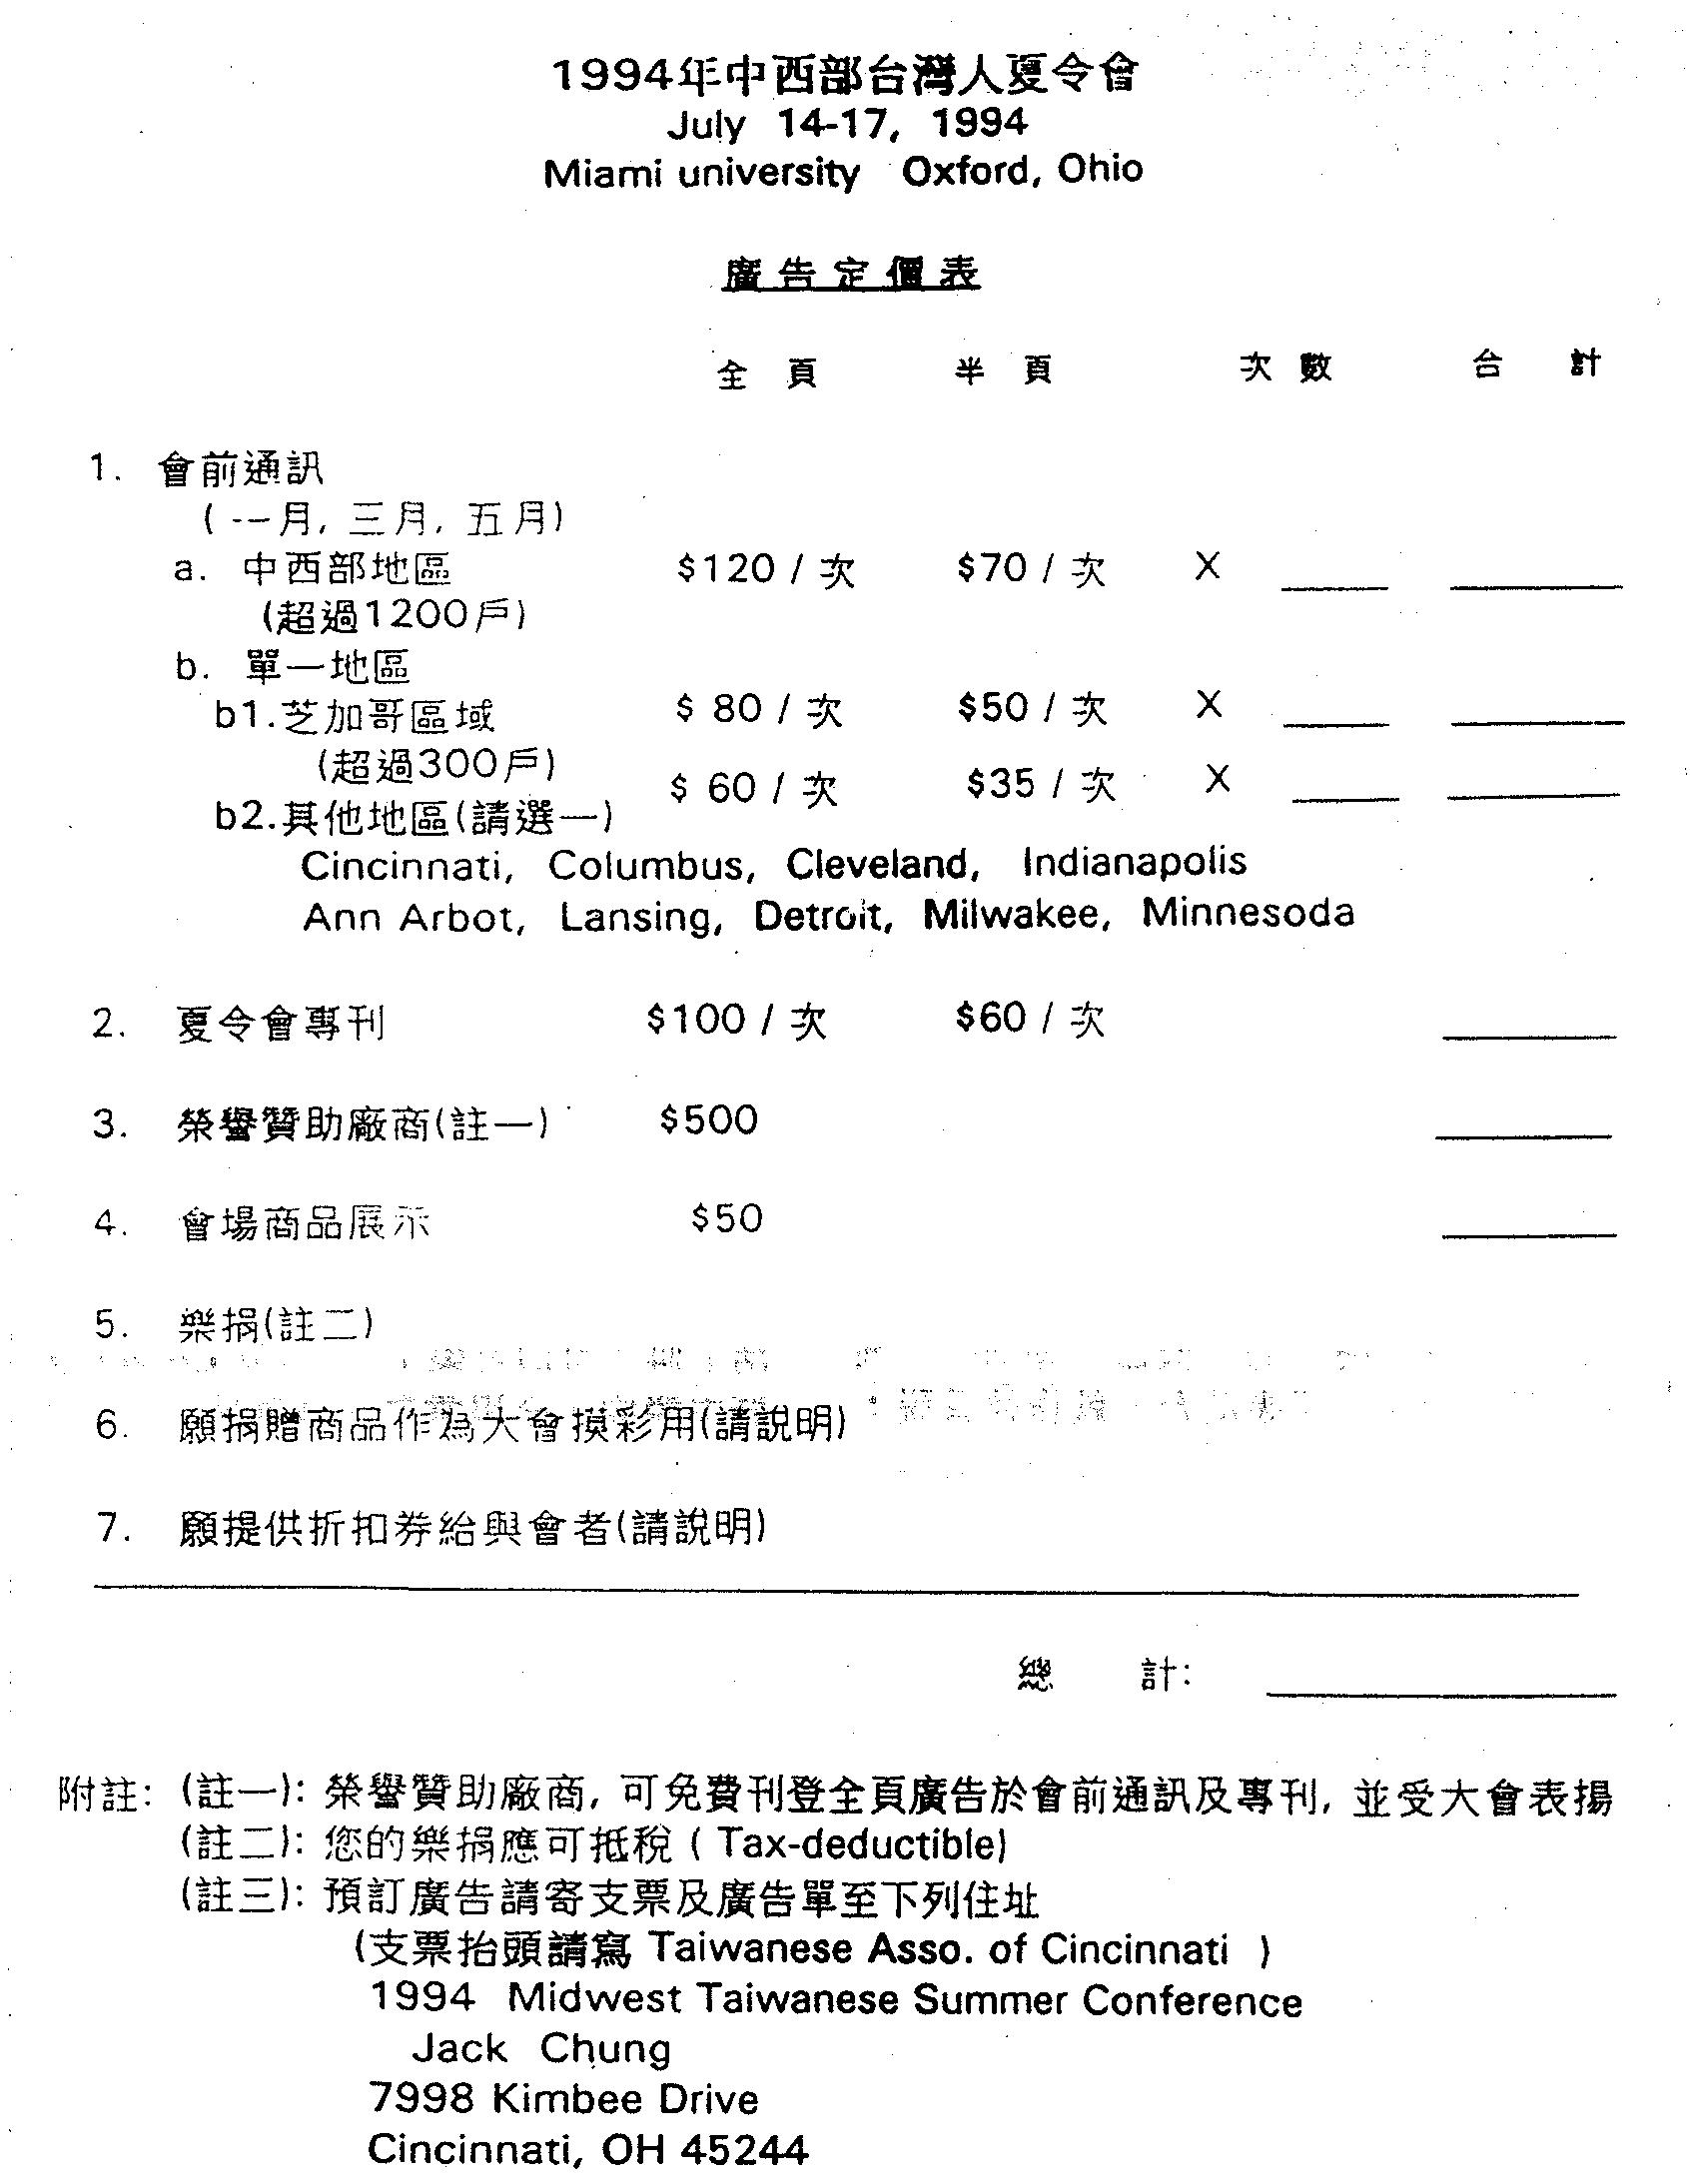 MTSC 1994